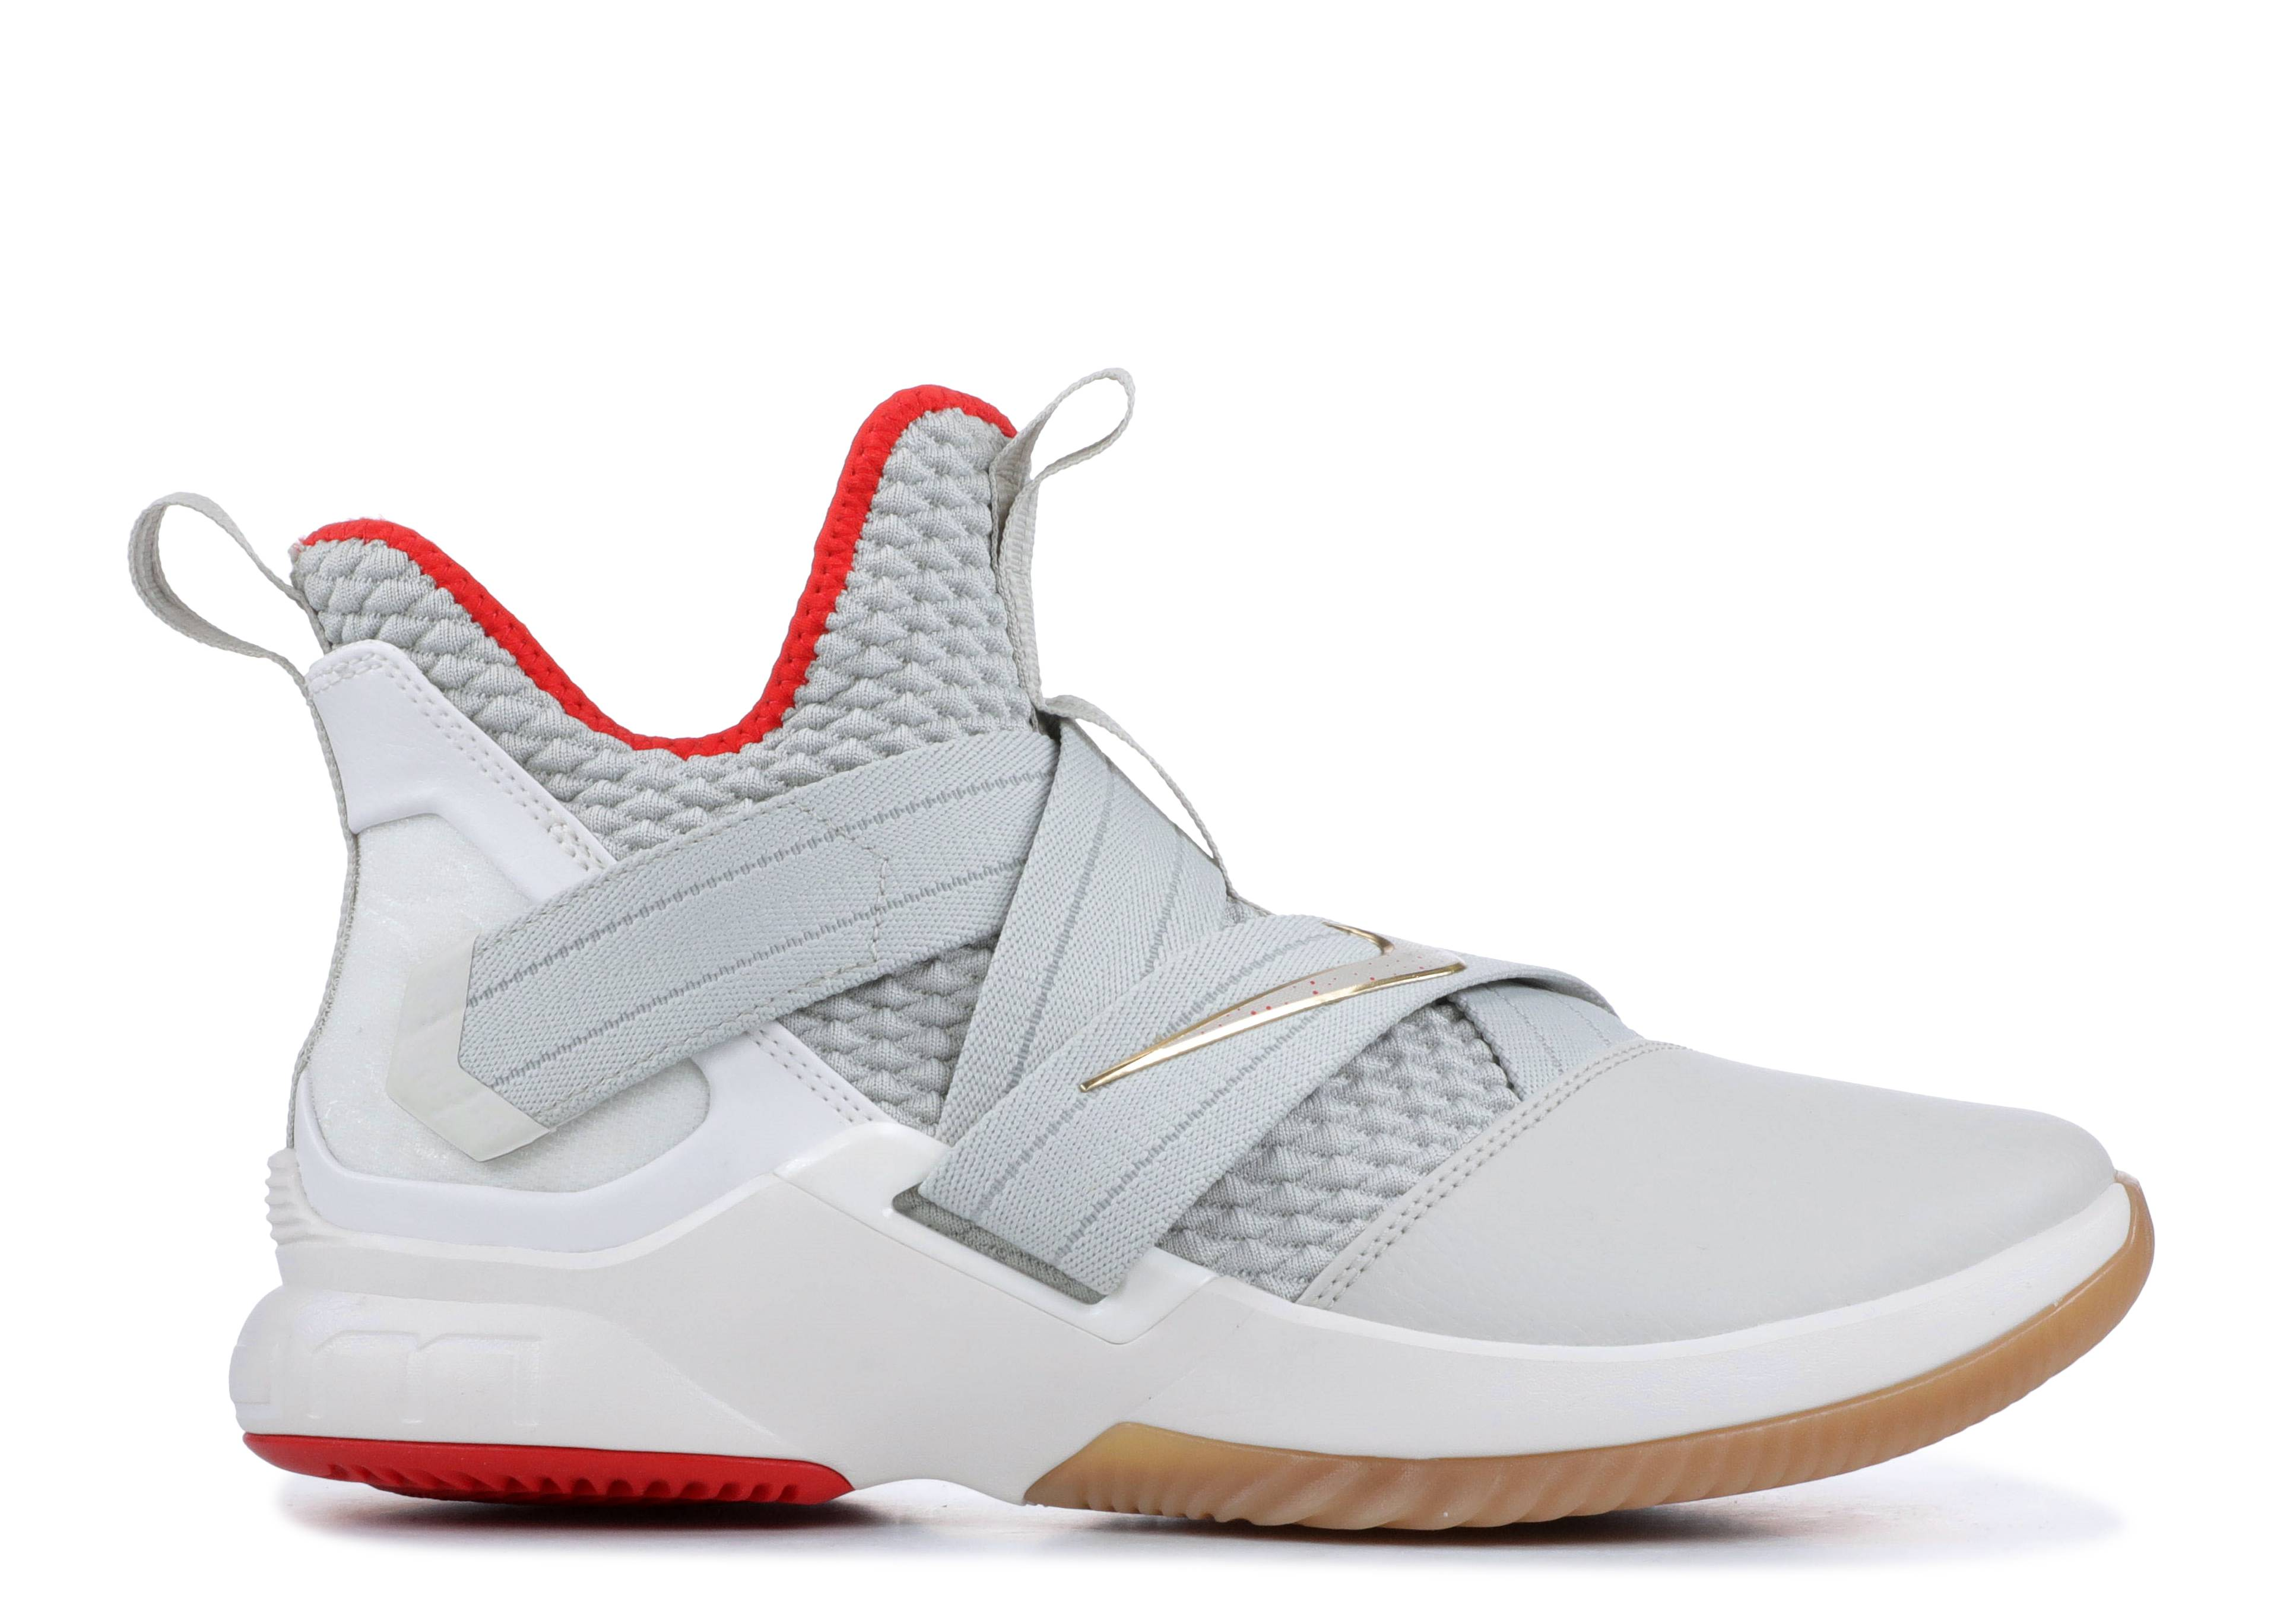 2941567c6763 Nike LeBron Soldier 12 - Nike - ao2609 002 - light bone light bone ...